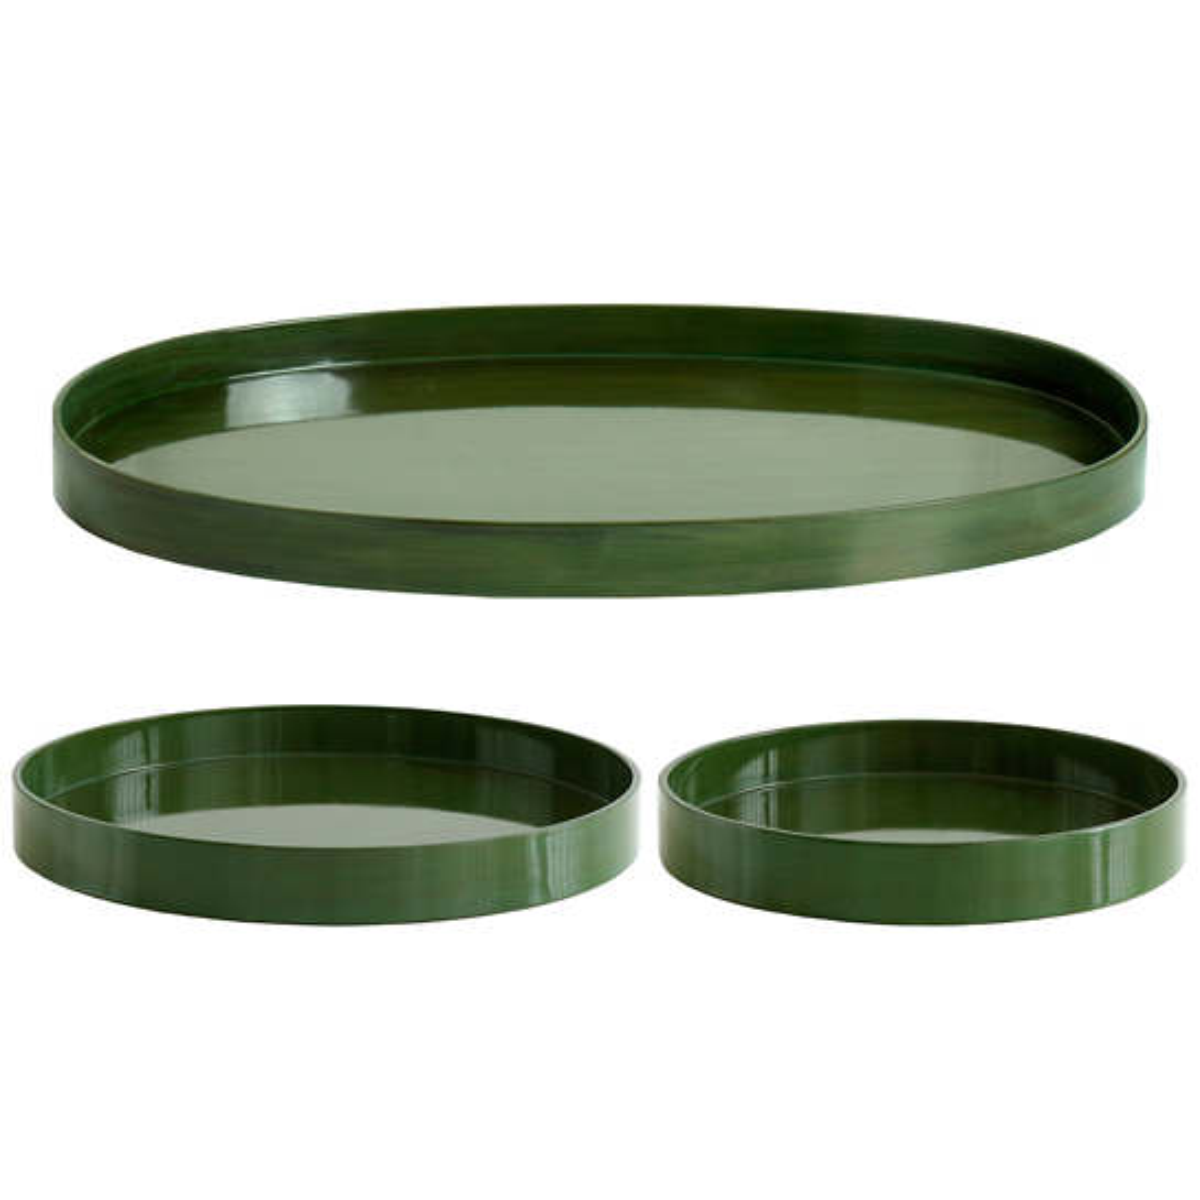 Evergreen Modular Tray